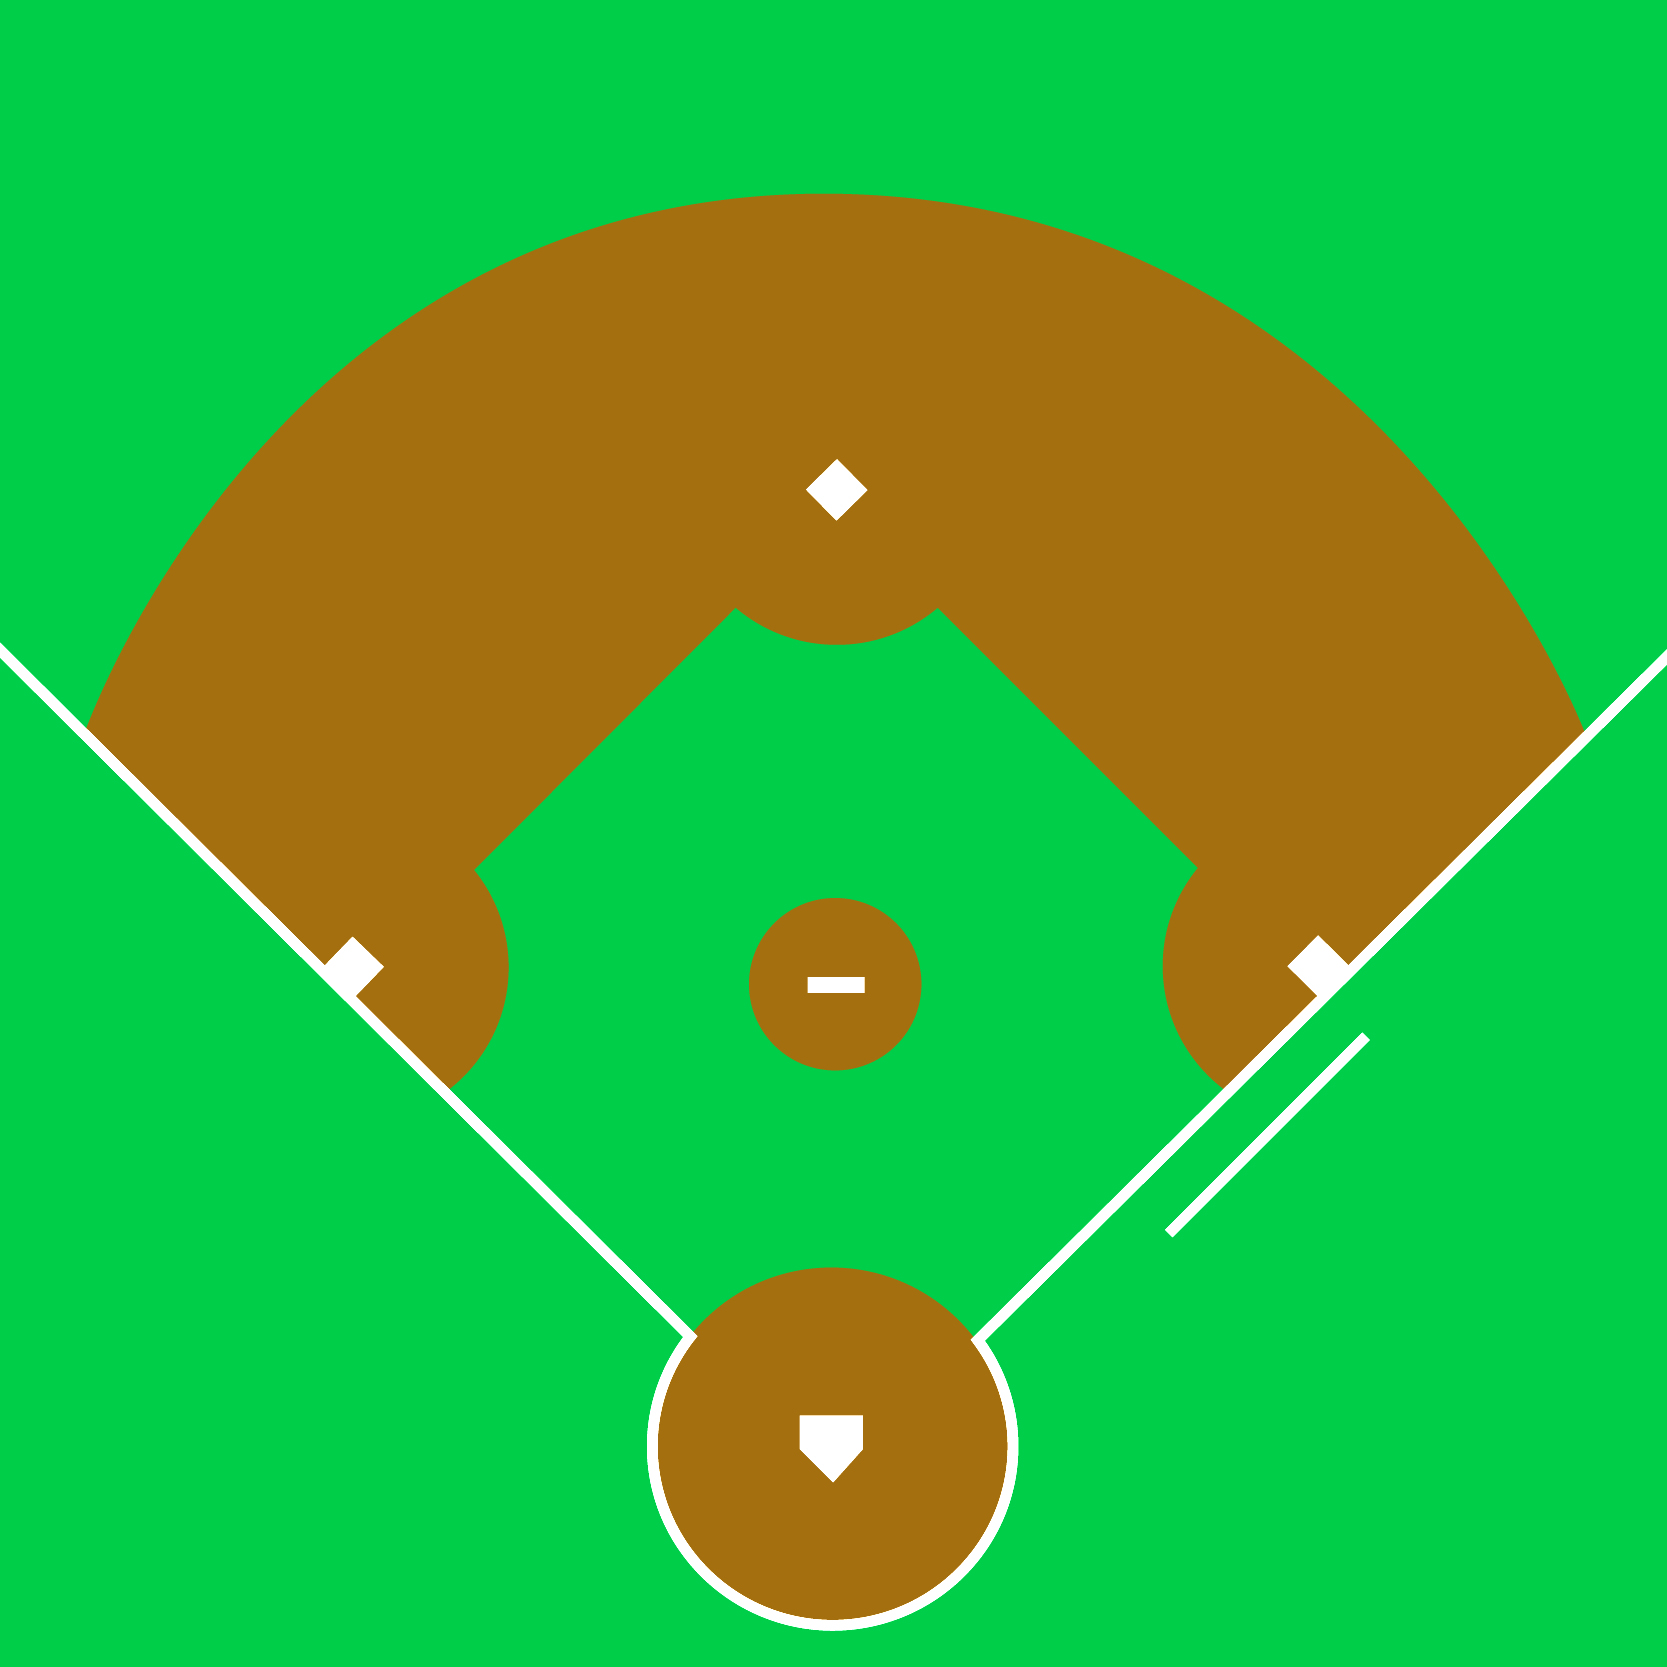 Baseball Diamond Images Baseball Diamond-Baseball Diamond Images Baseball Diamond And Bats On-10